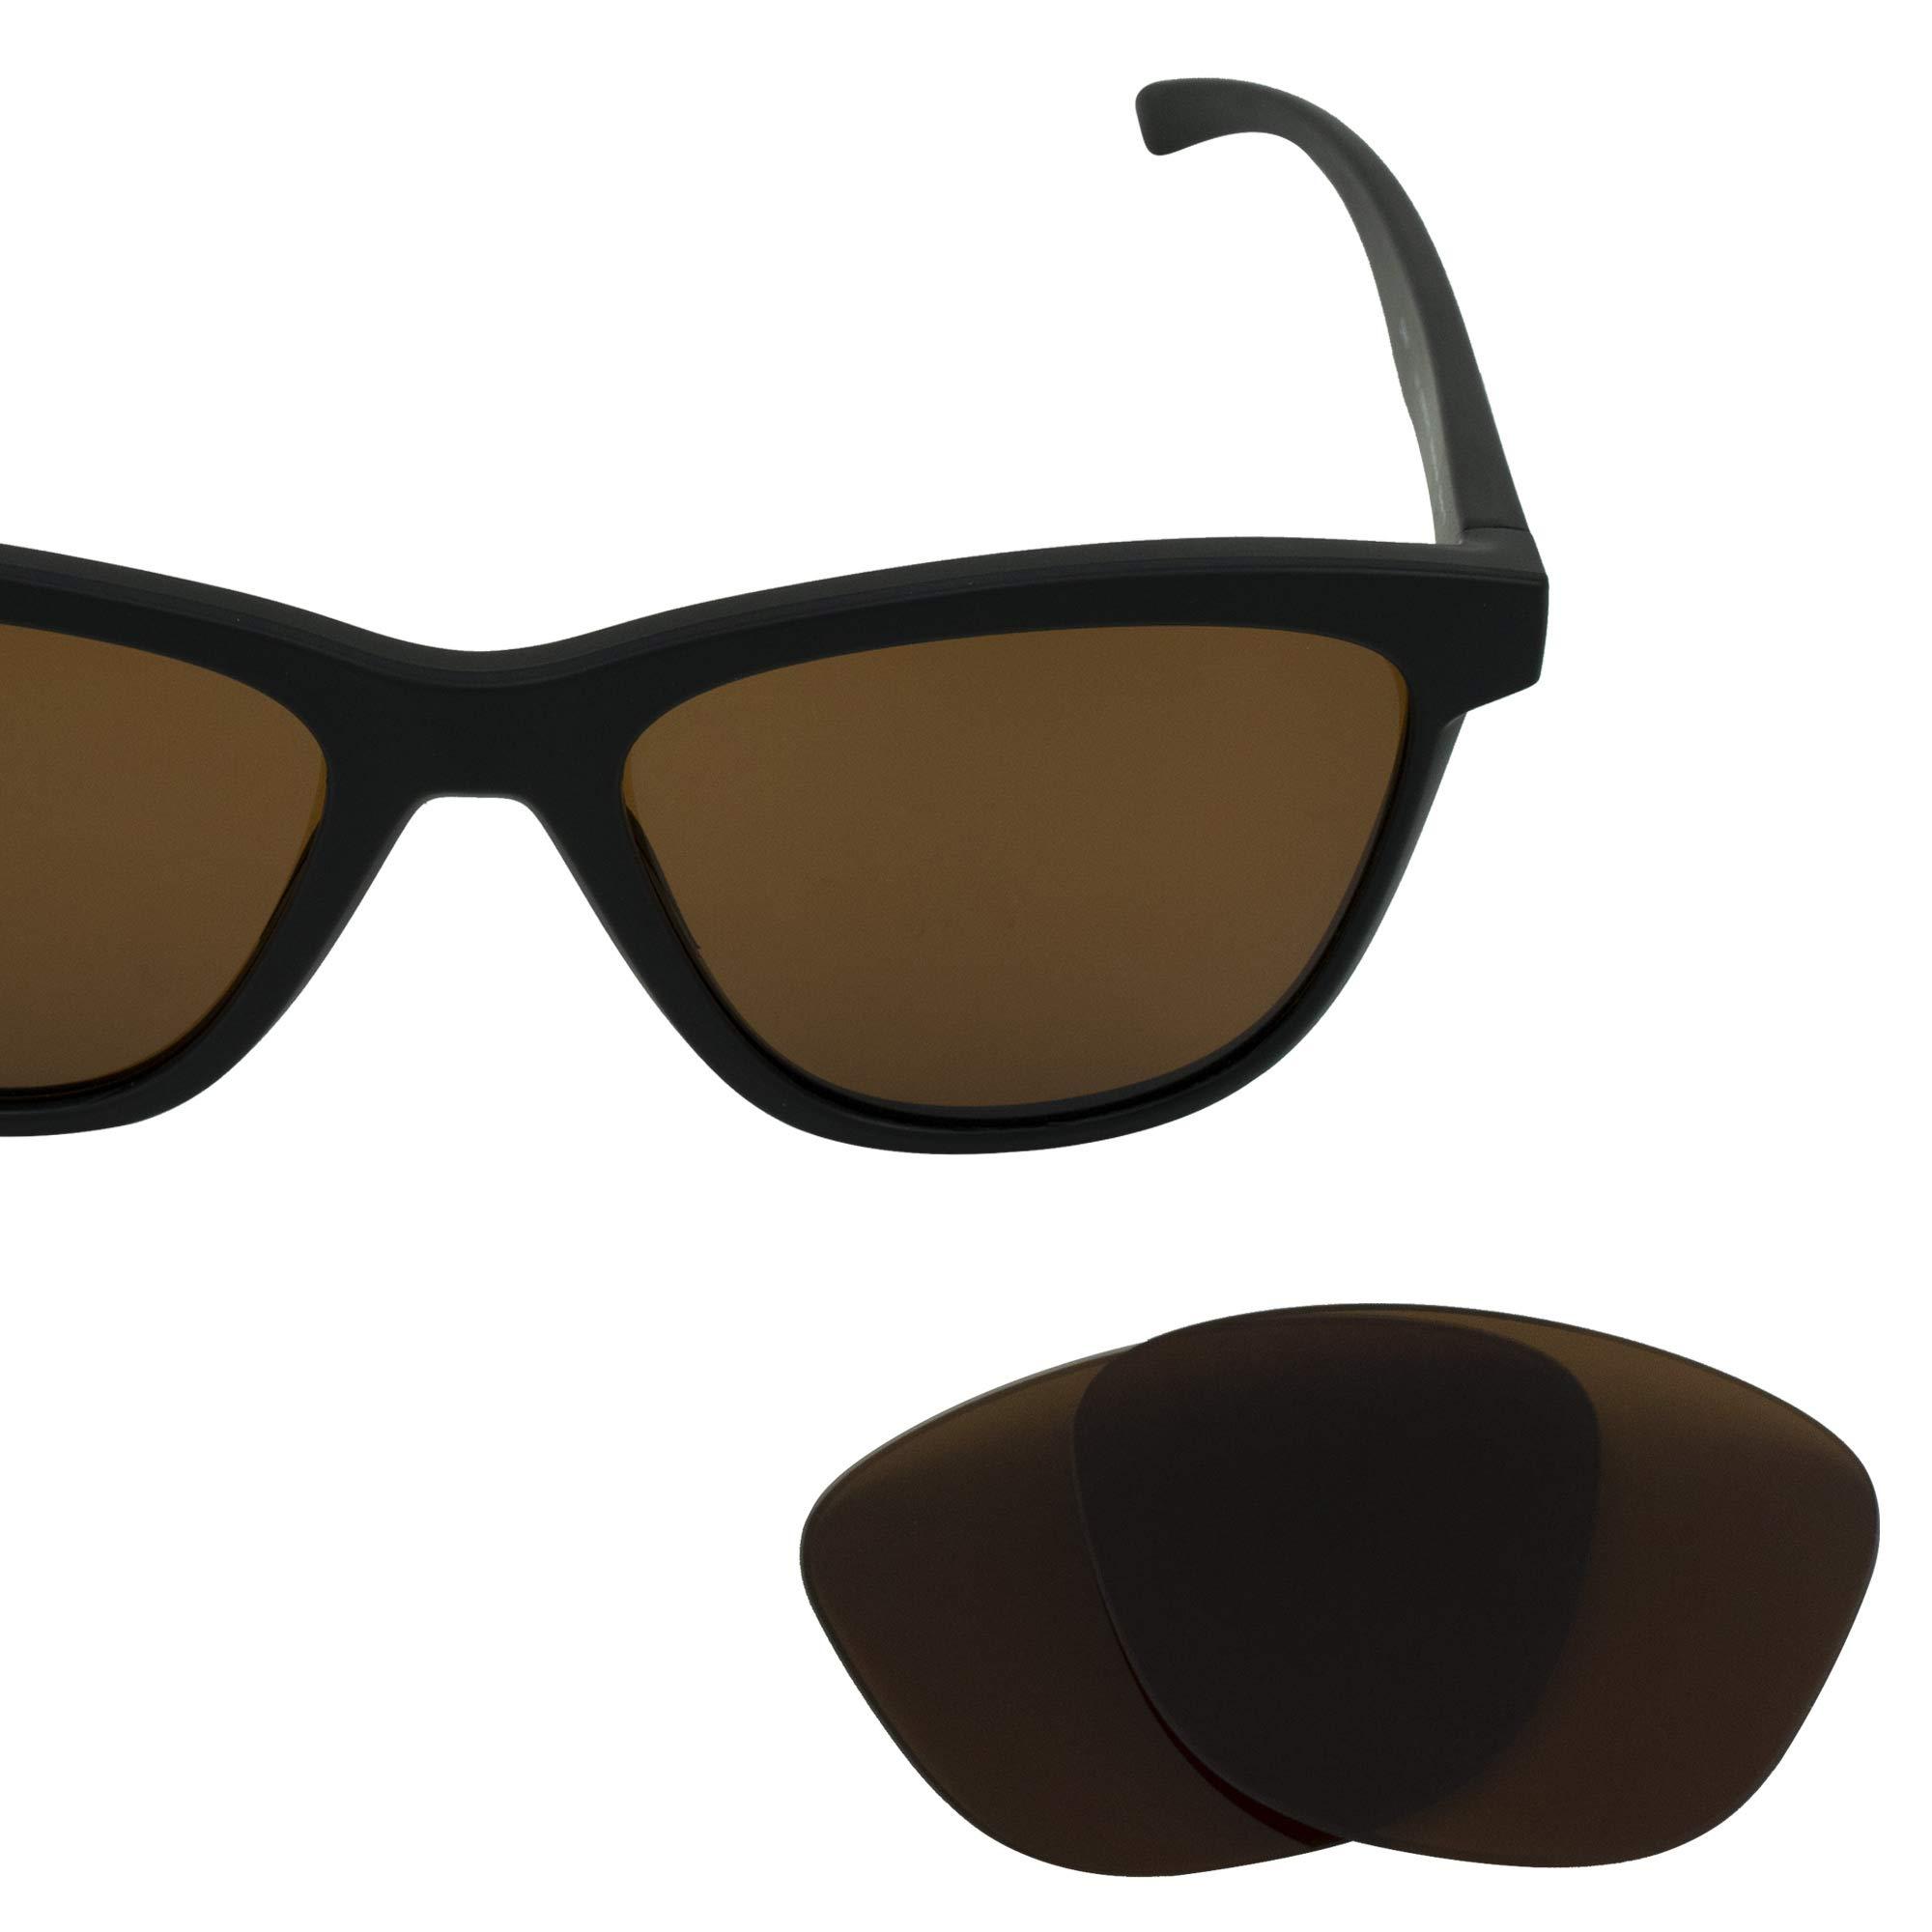 LenzFlip Replacement Lenses for Oakley Moonlighter | Women's Brown Polarized | 100% UV Protection